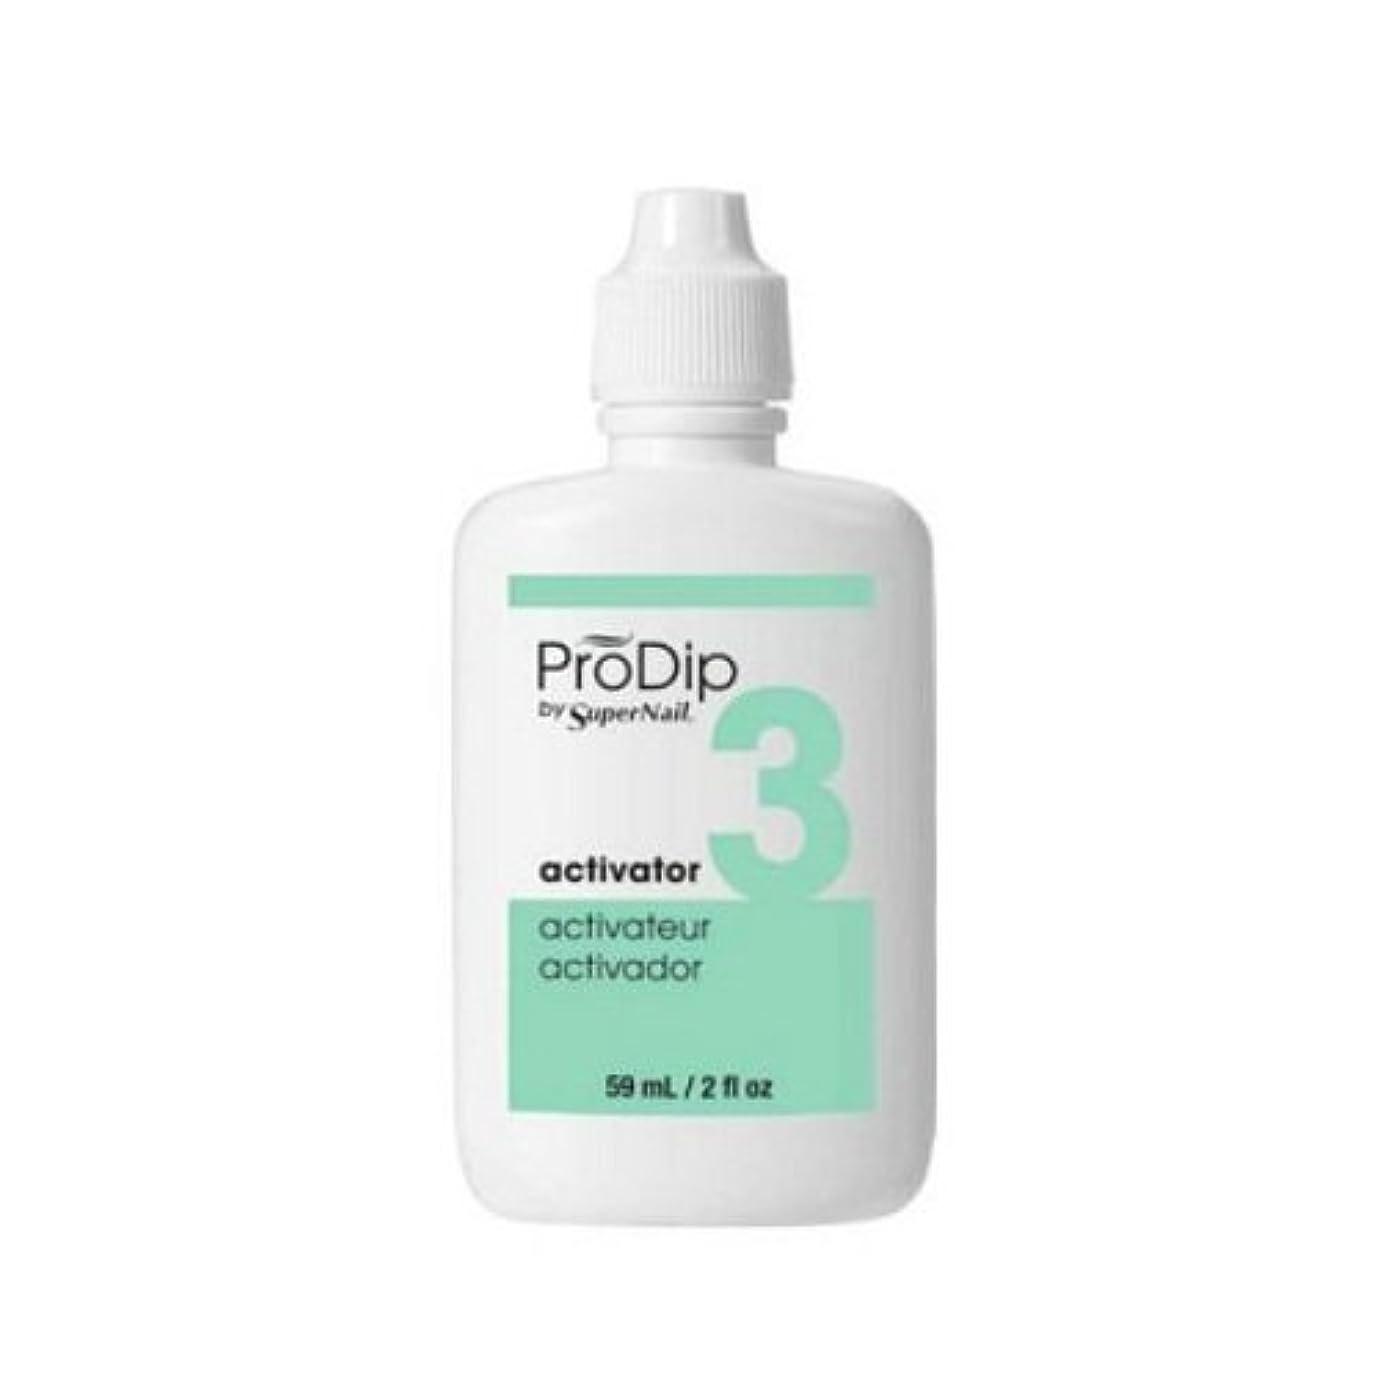 SuperNail ProDip - Activator - 59 ml/2 oz